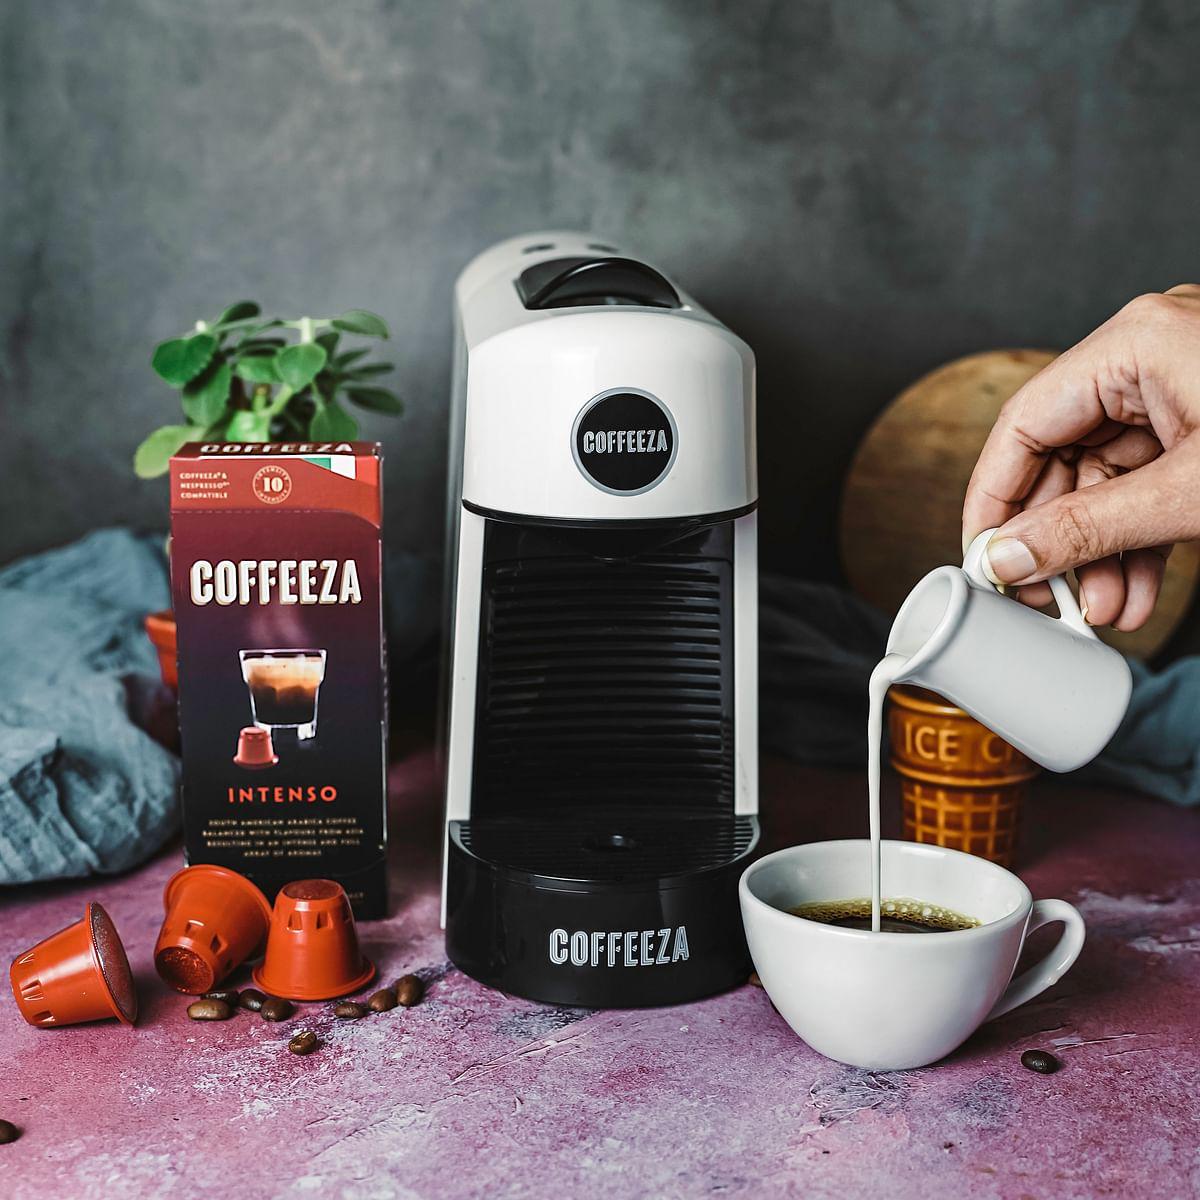 Coffeeza launches new coffee capsules and coffee machine